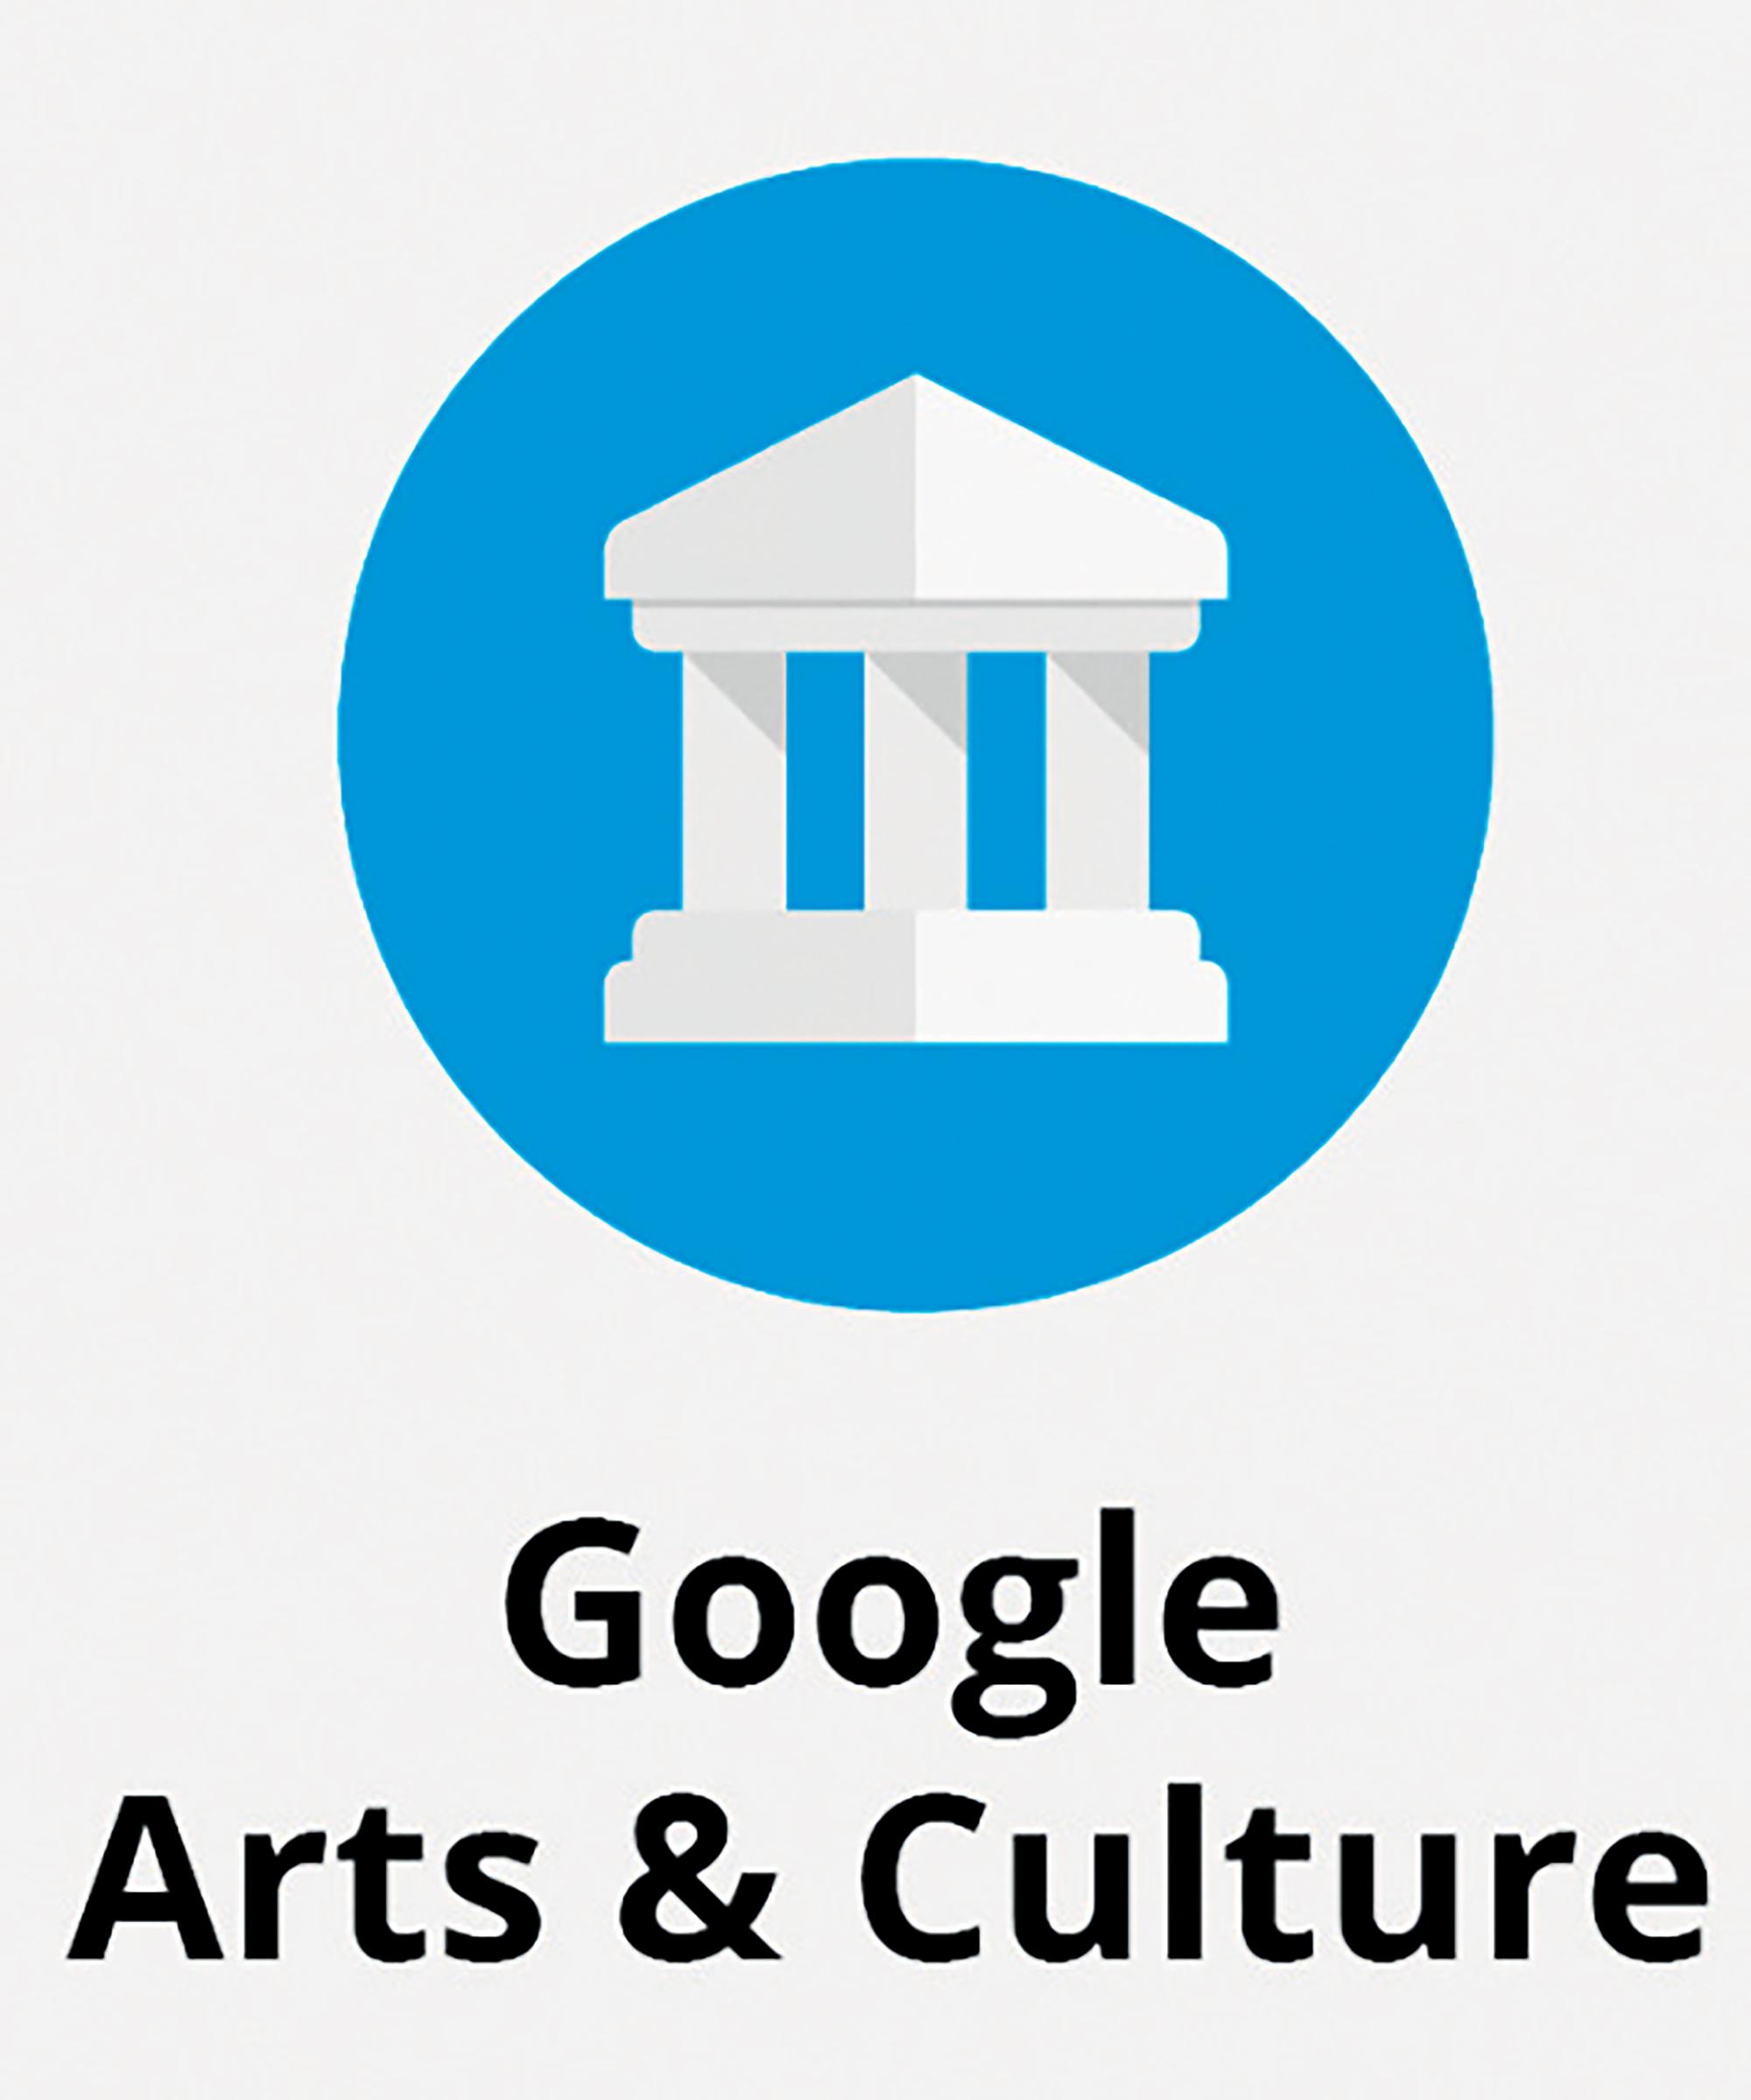 du lịch Google Art Culture